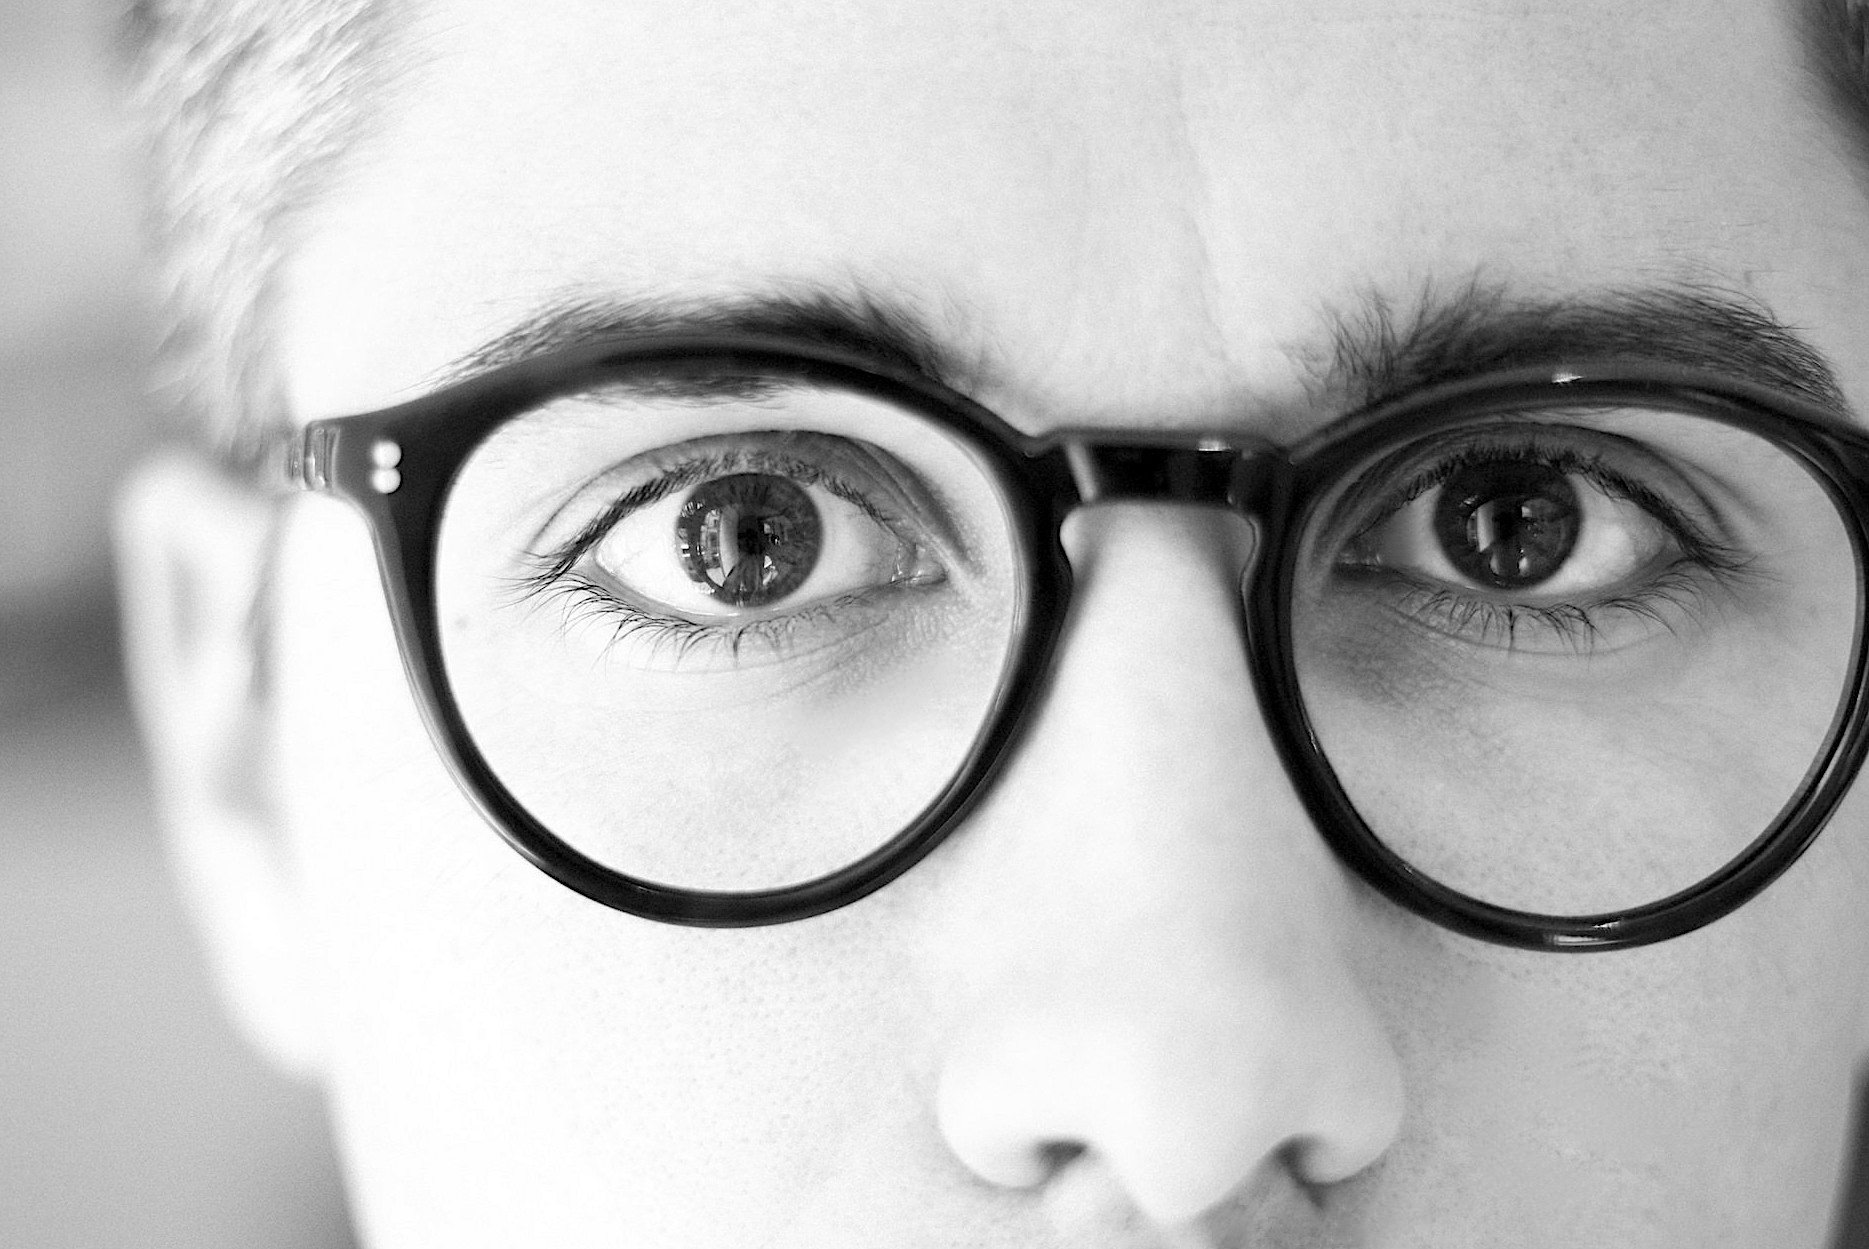 ateliers baudin lunettes sur mesure paris verygoodlord arnaud chanteloup